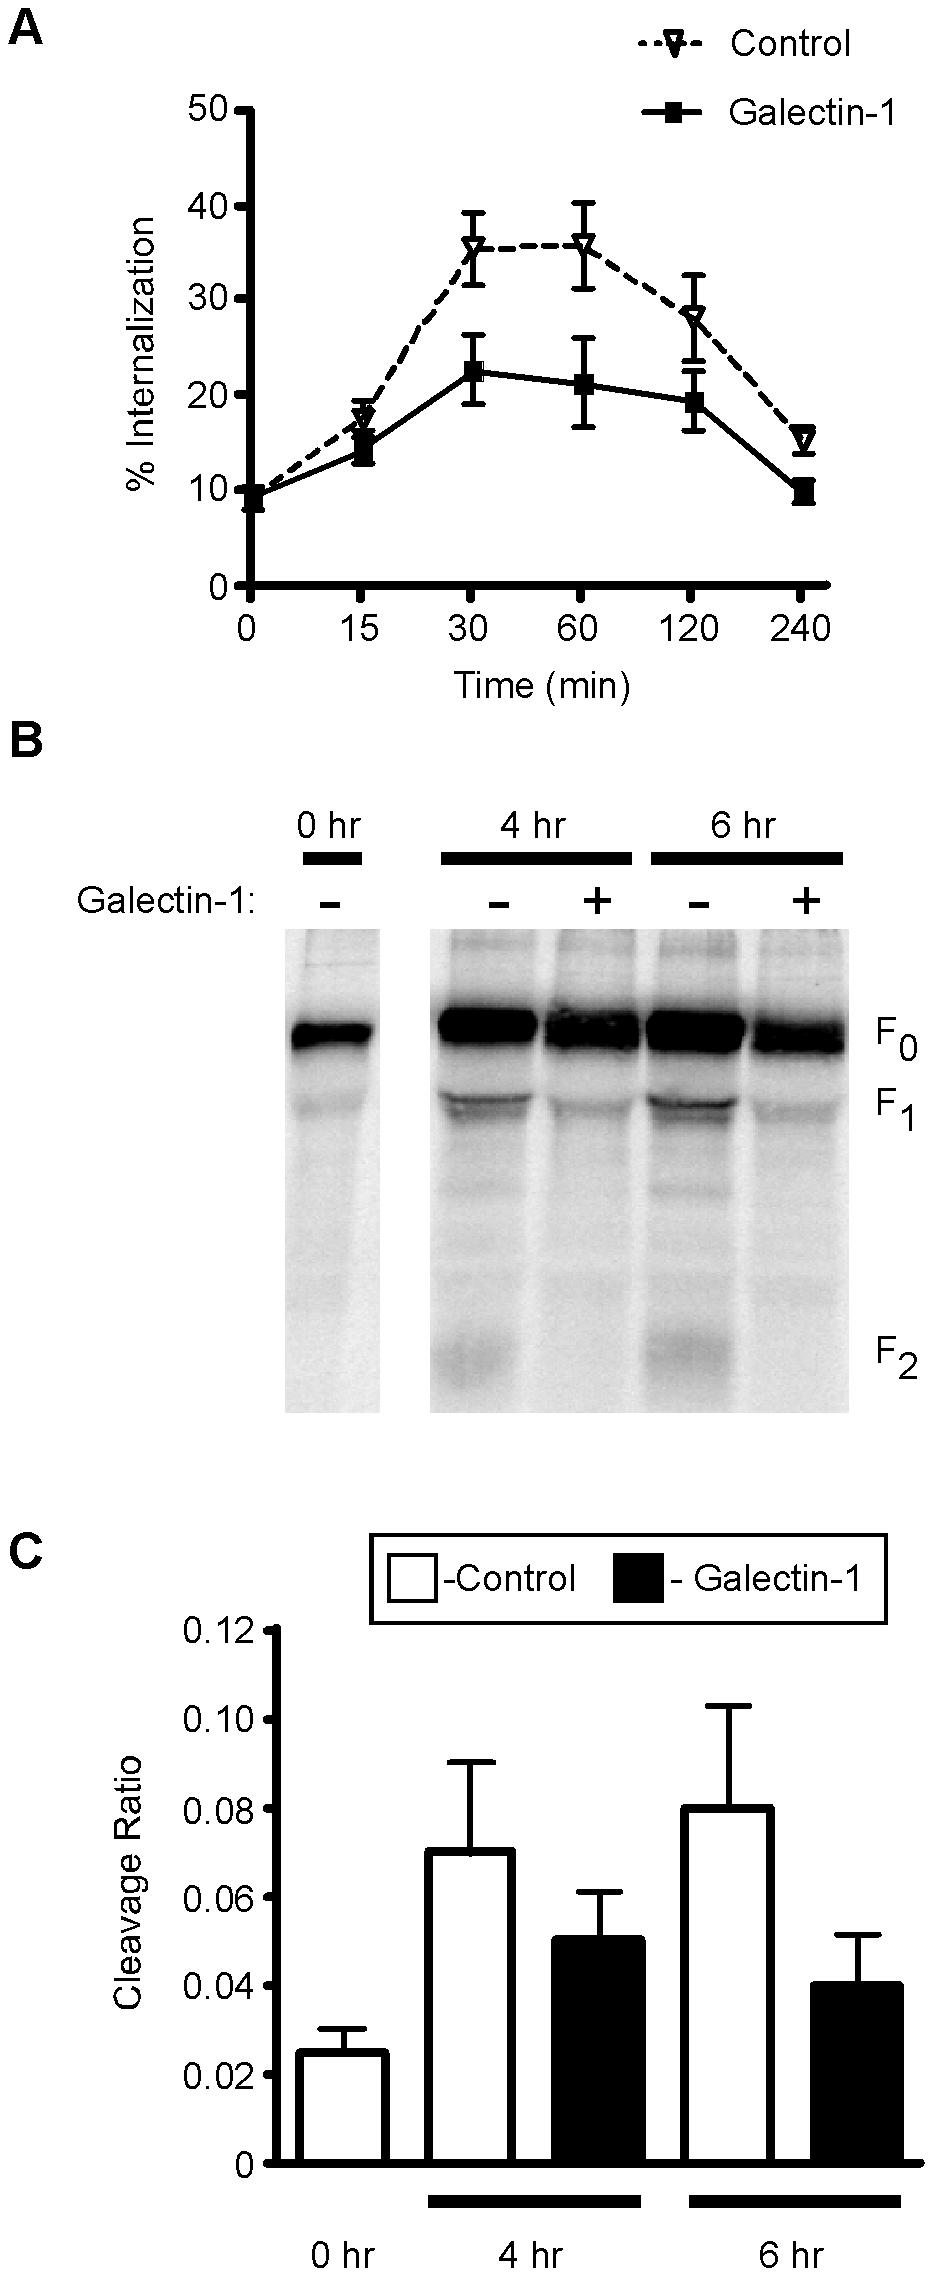 Galectin-1 inhibits NiV-F<sub>0</sub> endocytosis and maturation.